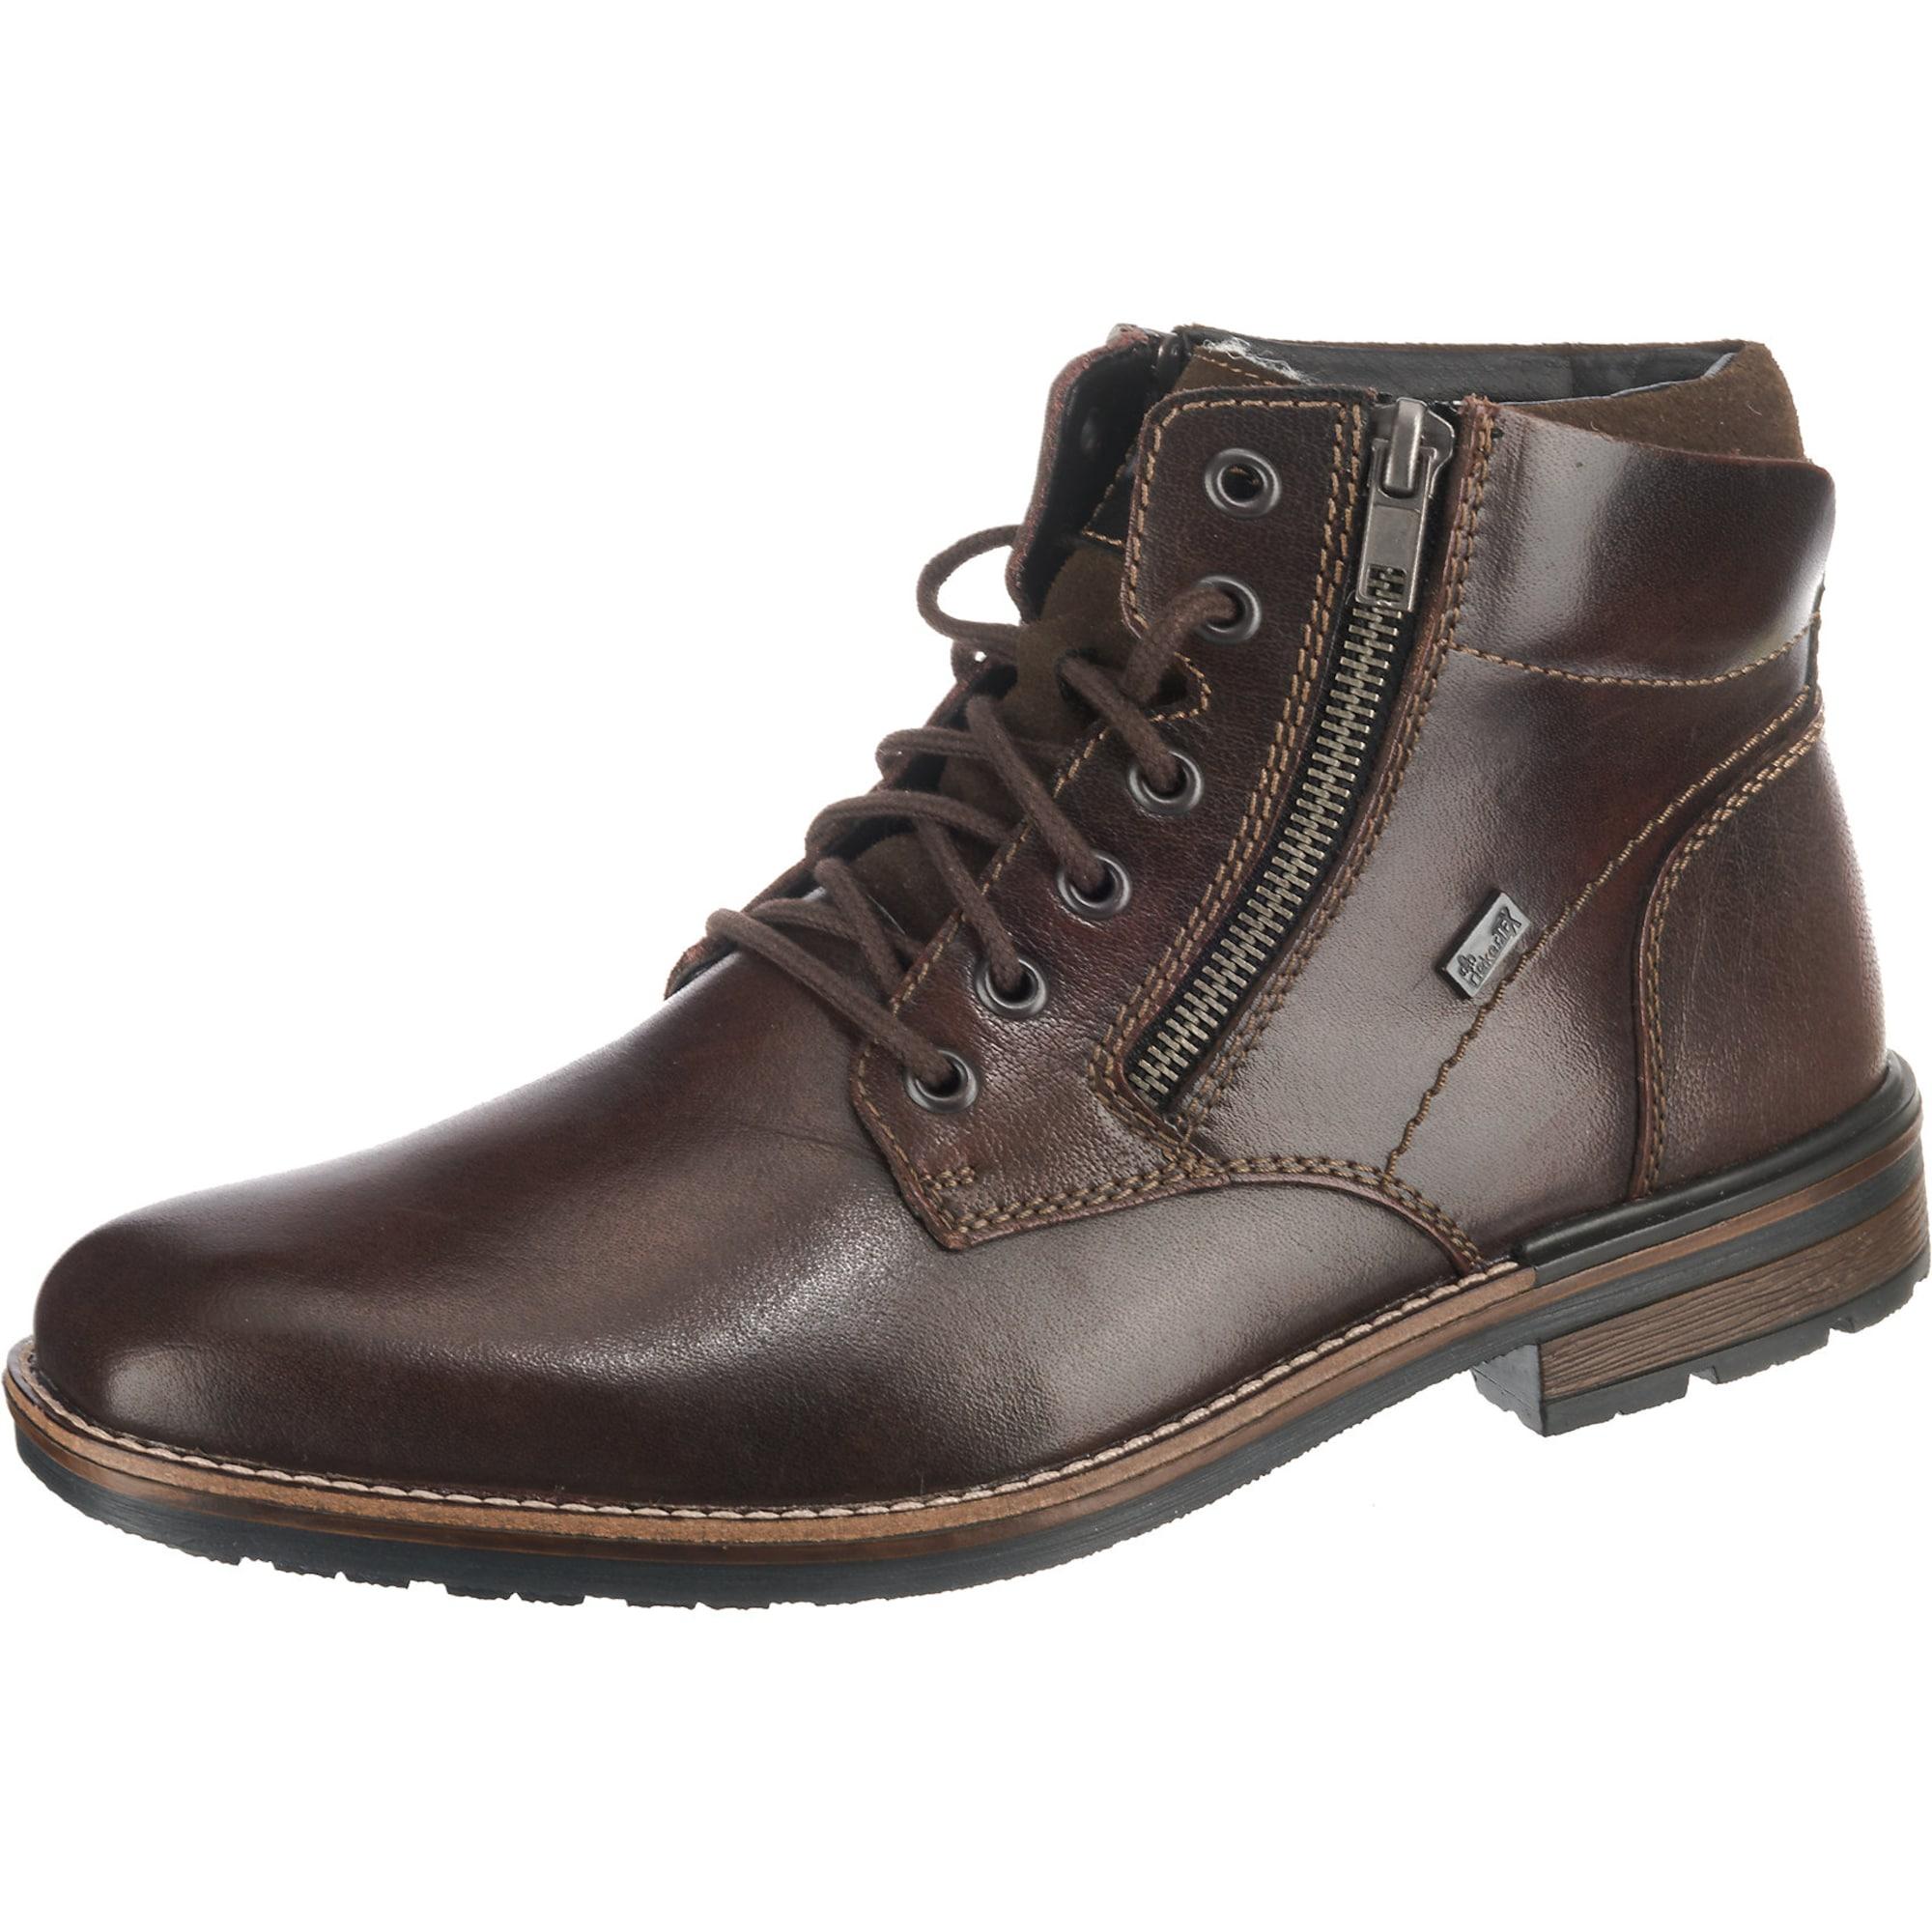 Winterstiefel   Schuhe > Boots > Winterstiefel   Rieker